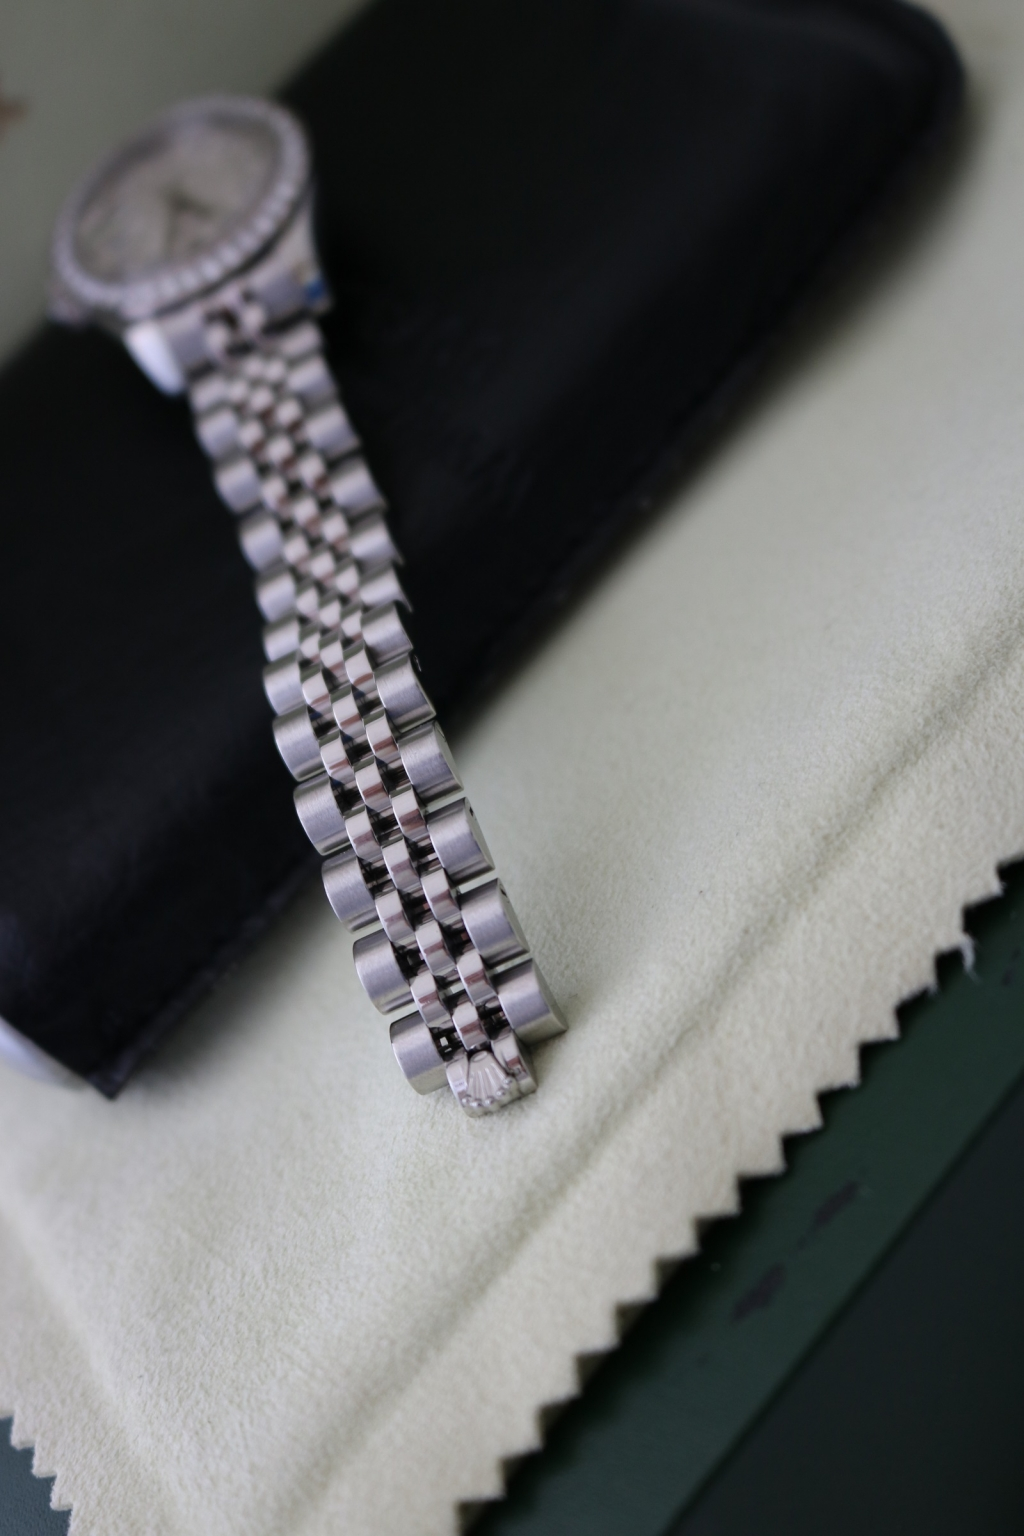 Bán đồng hồ rolex datejust 6 số 179174 – Inox – Mặt vi tính xoàn – Size 26mm